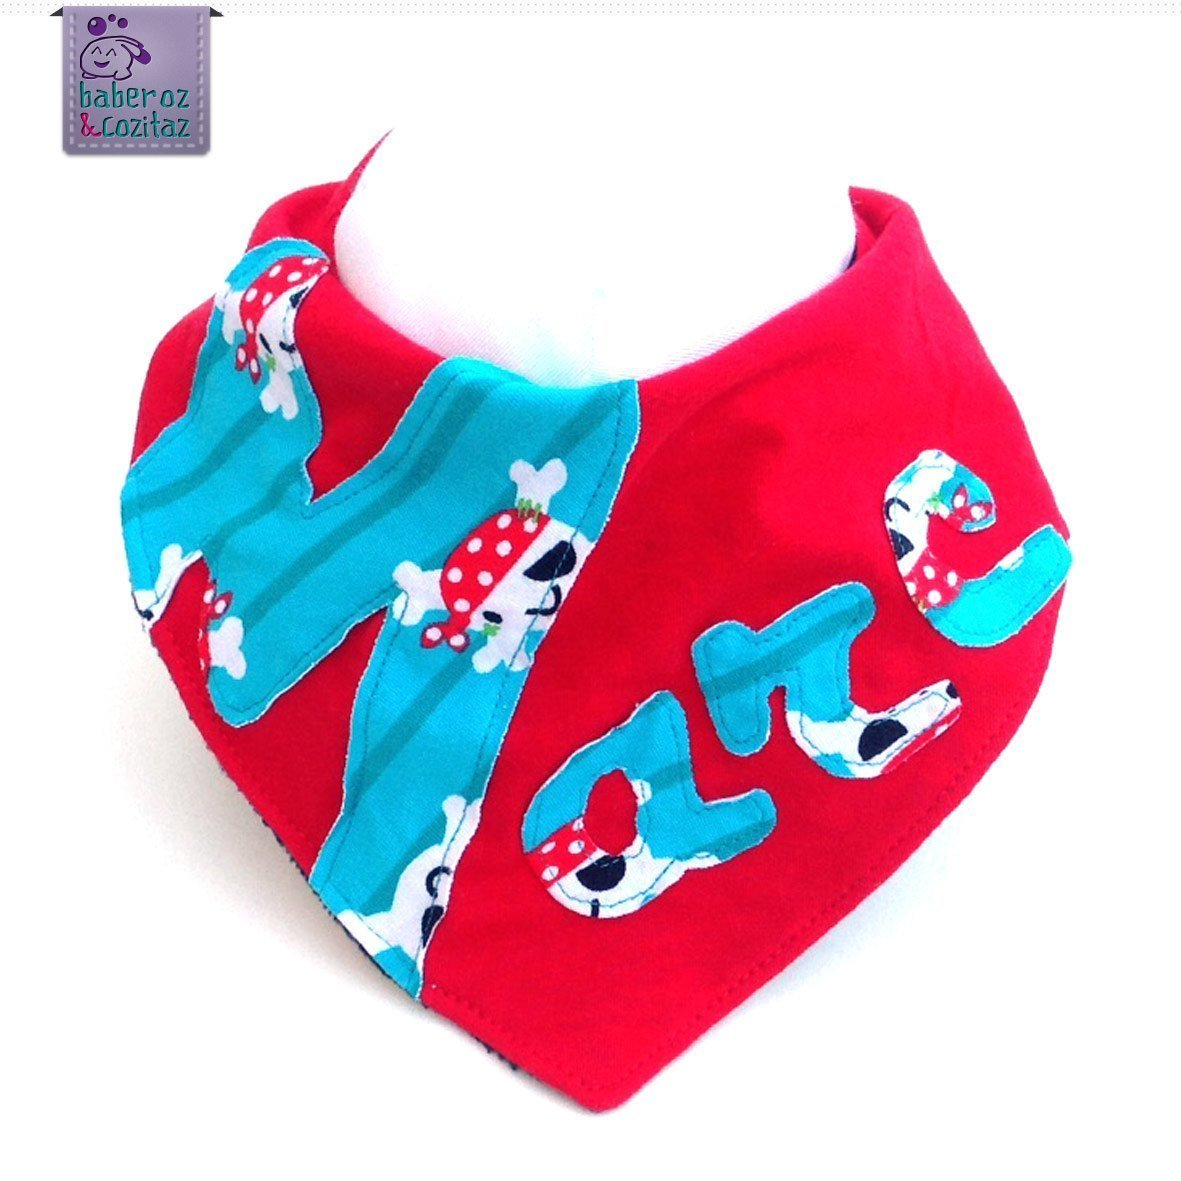 Babero bandana personalizado con el nombre que quieras. Para bebé s, niñ os o adultos con necesidades especiales. P_69. ***Enví o gratuito a Españ a***